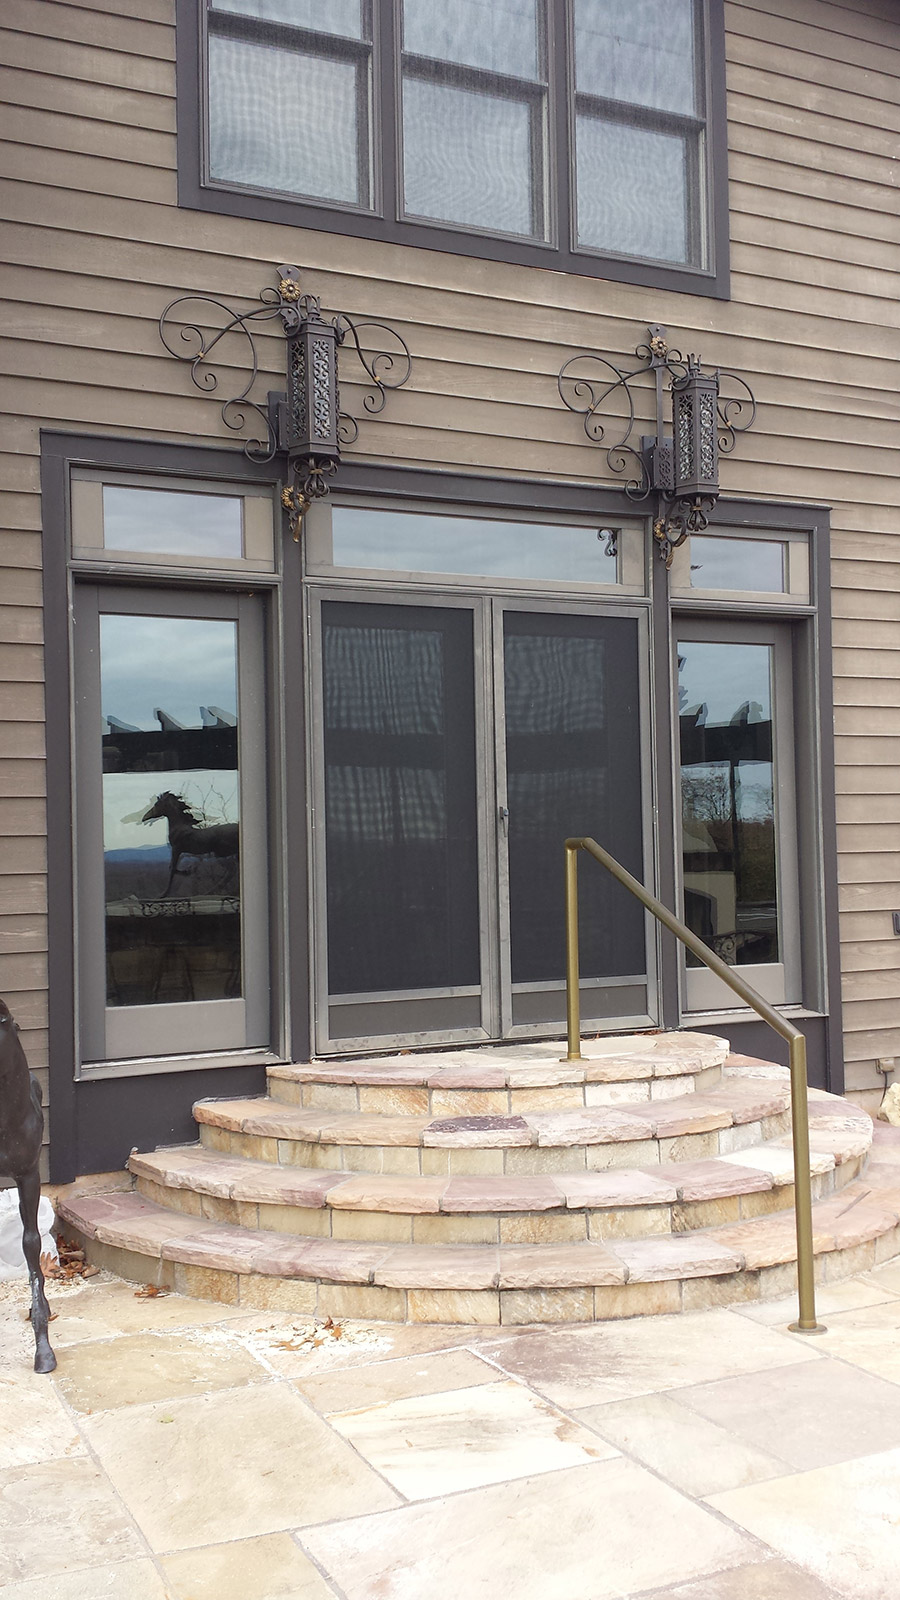 Custom-Victory-iron-lighting-fixture-foyer-hall-pendant-entry-kitchen-wrouhgt-iron-door-solara-ligthing-E007-023-EL-(4)